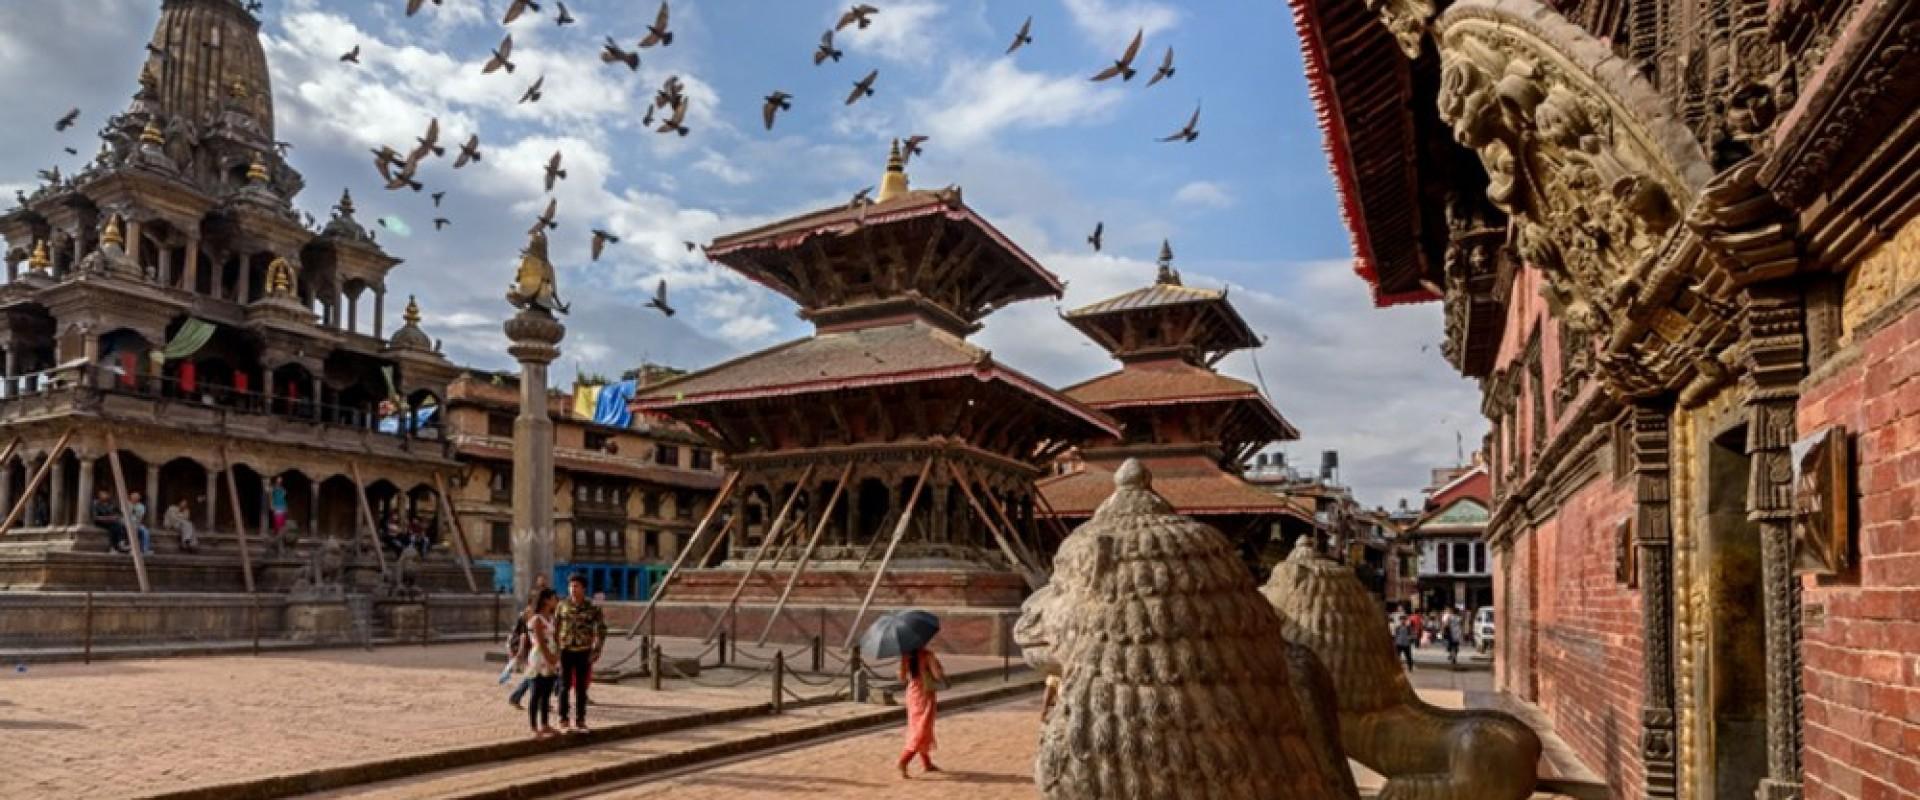 Patan Tourist Guide